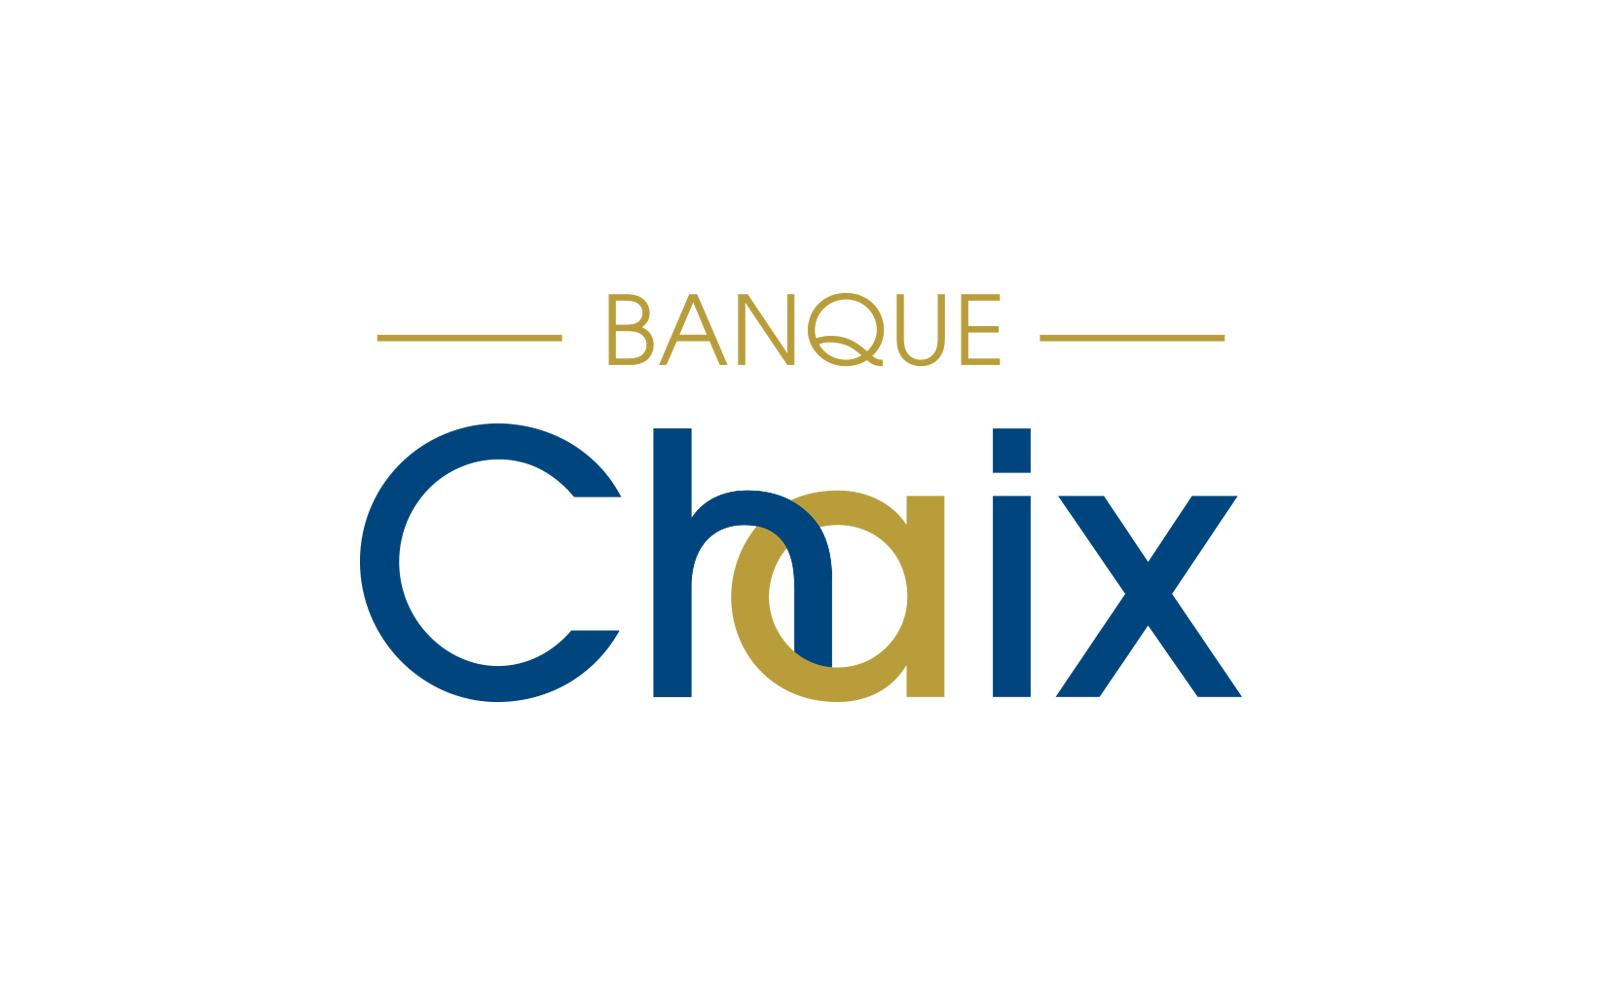 2Banque chaix-1